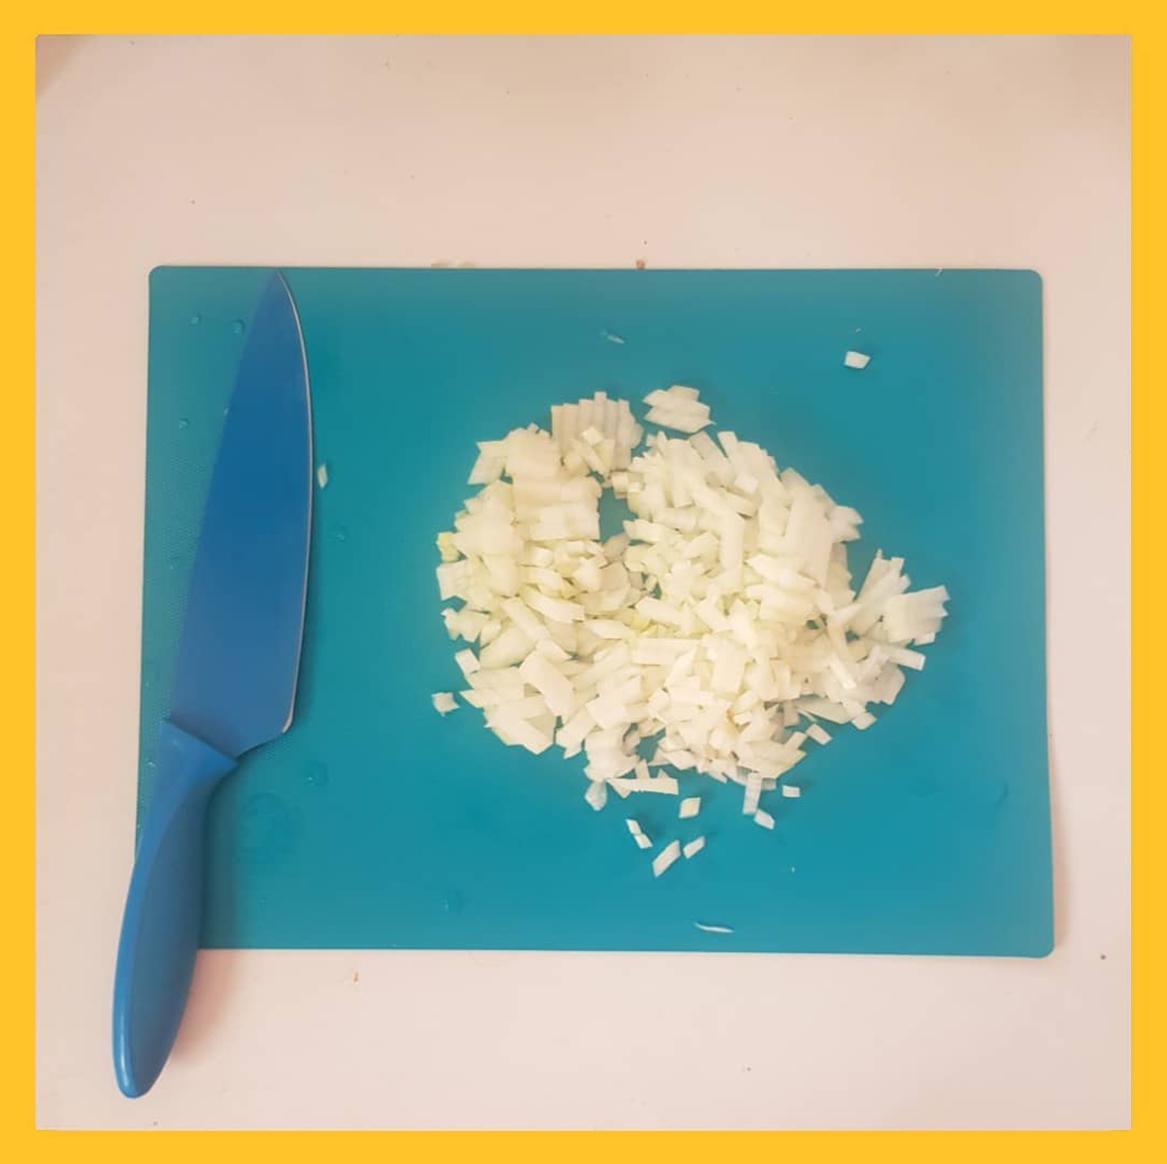 chopped oninon for flu vegetable soup ,پیاز خرد شده